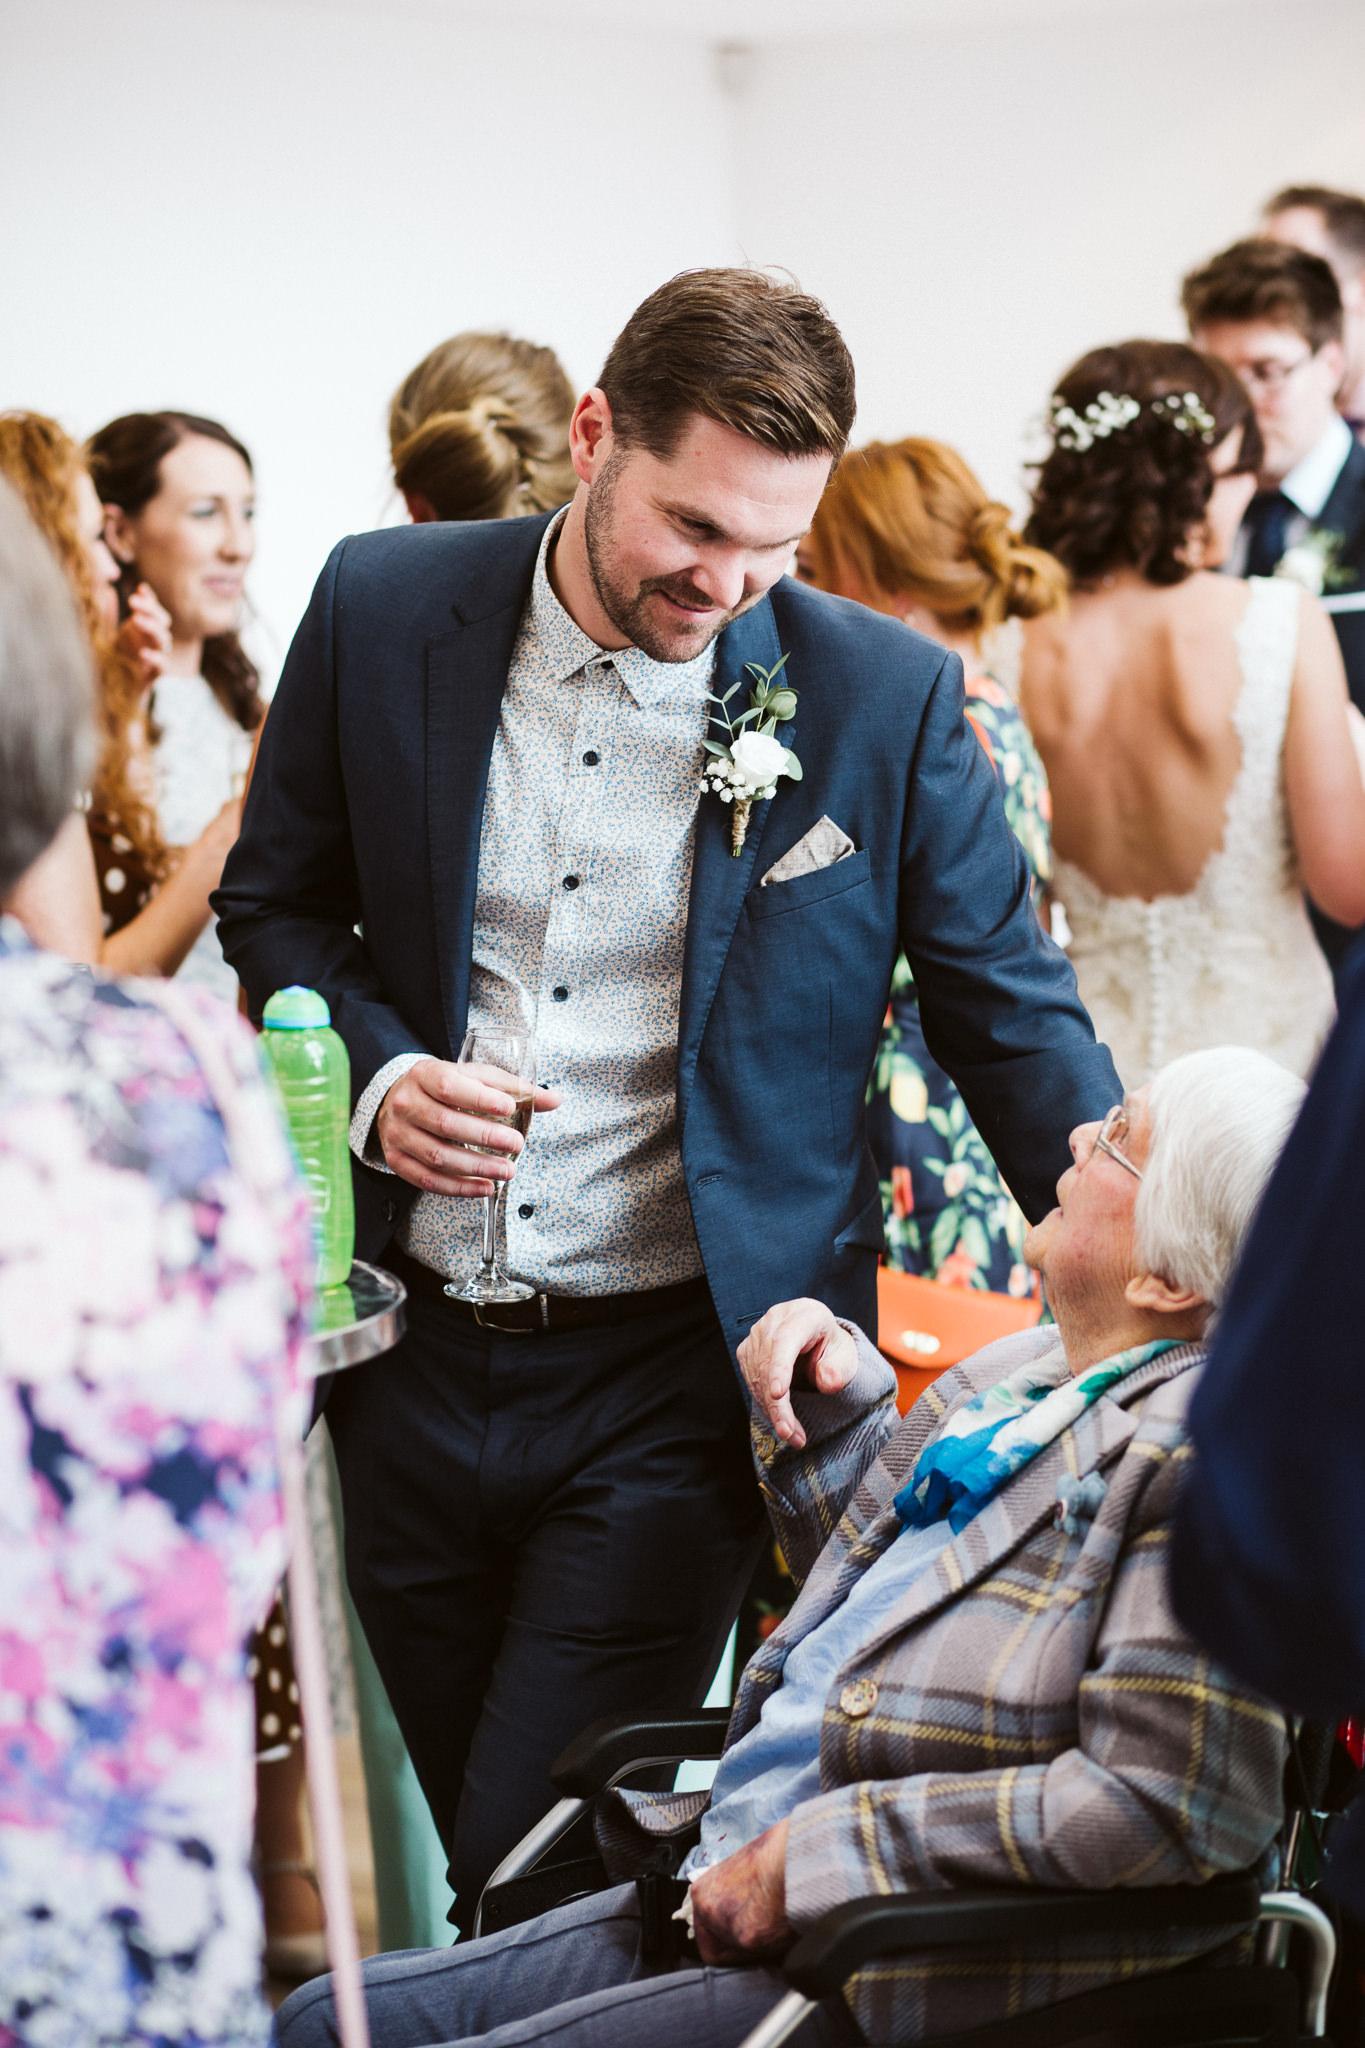 baltic-wedding-margarita-hope (38).jpg